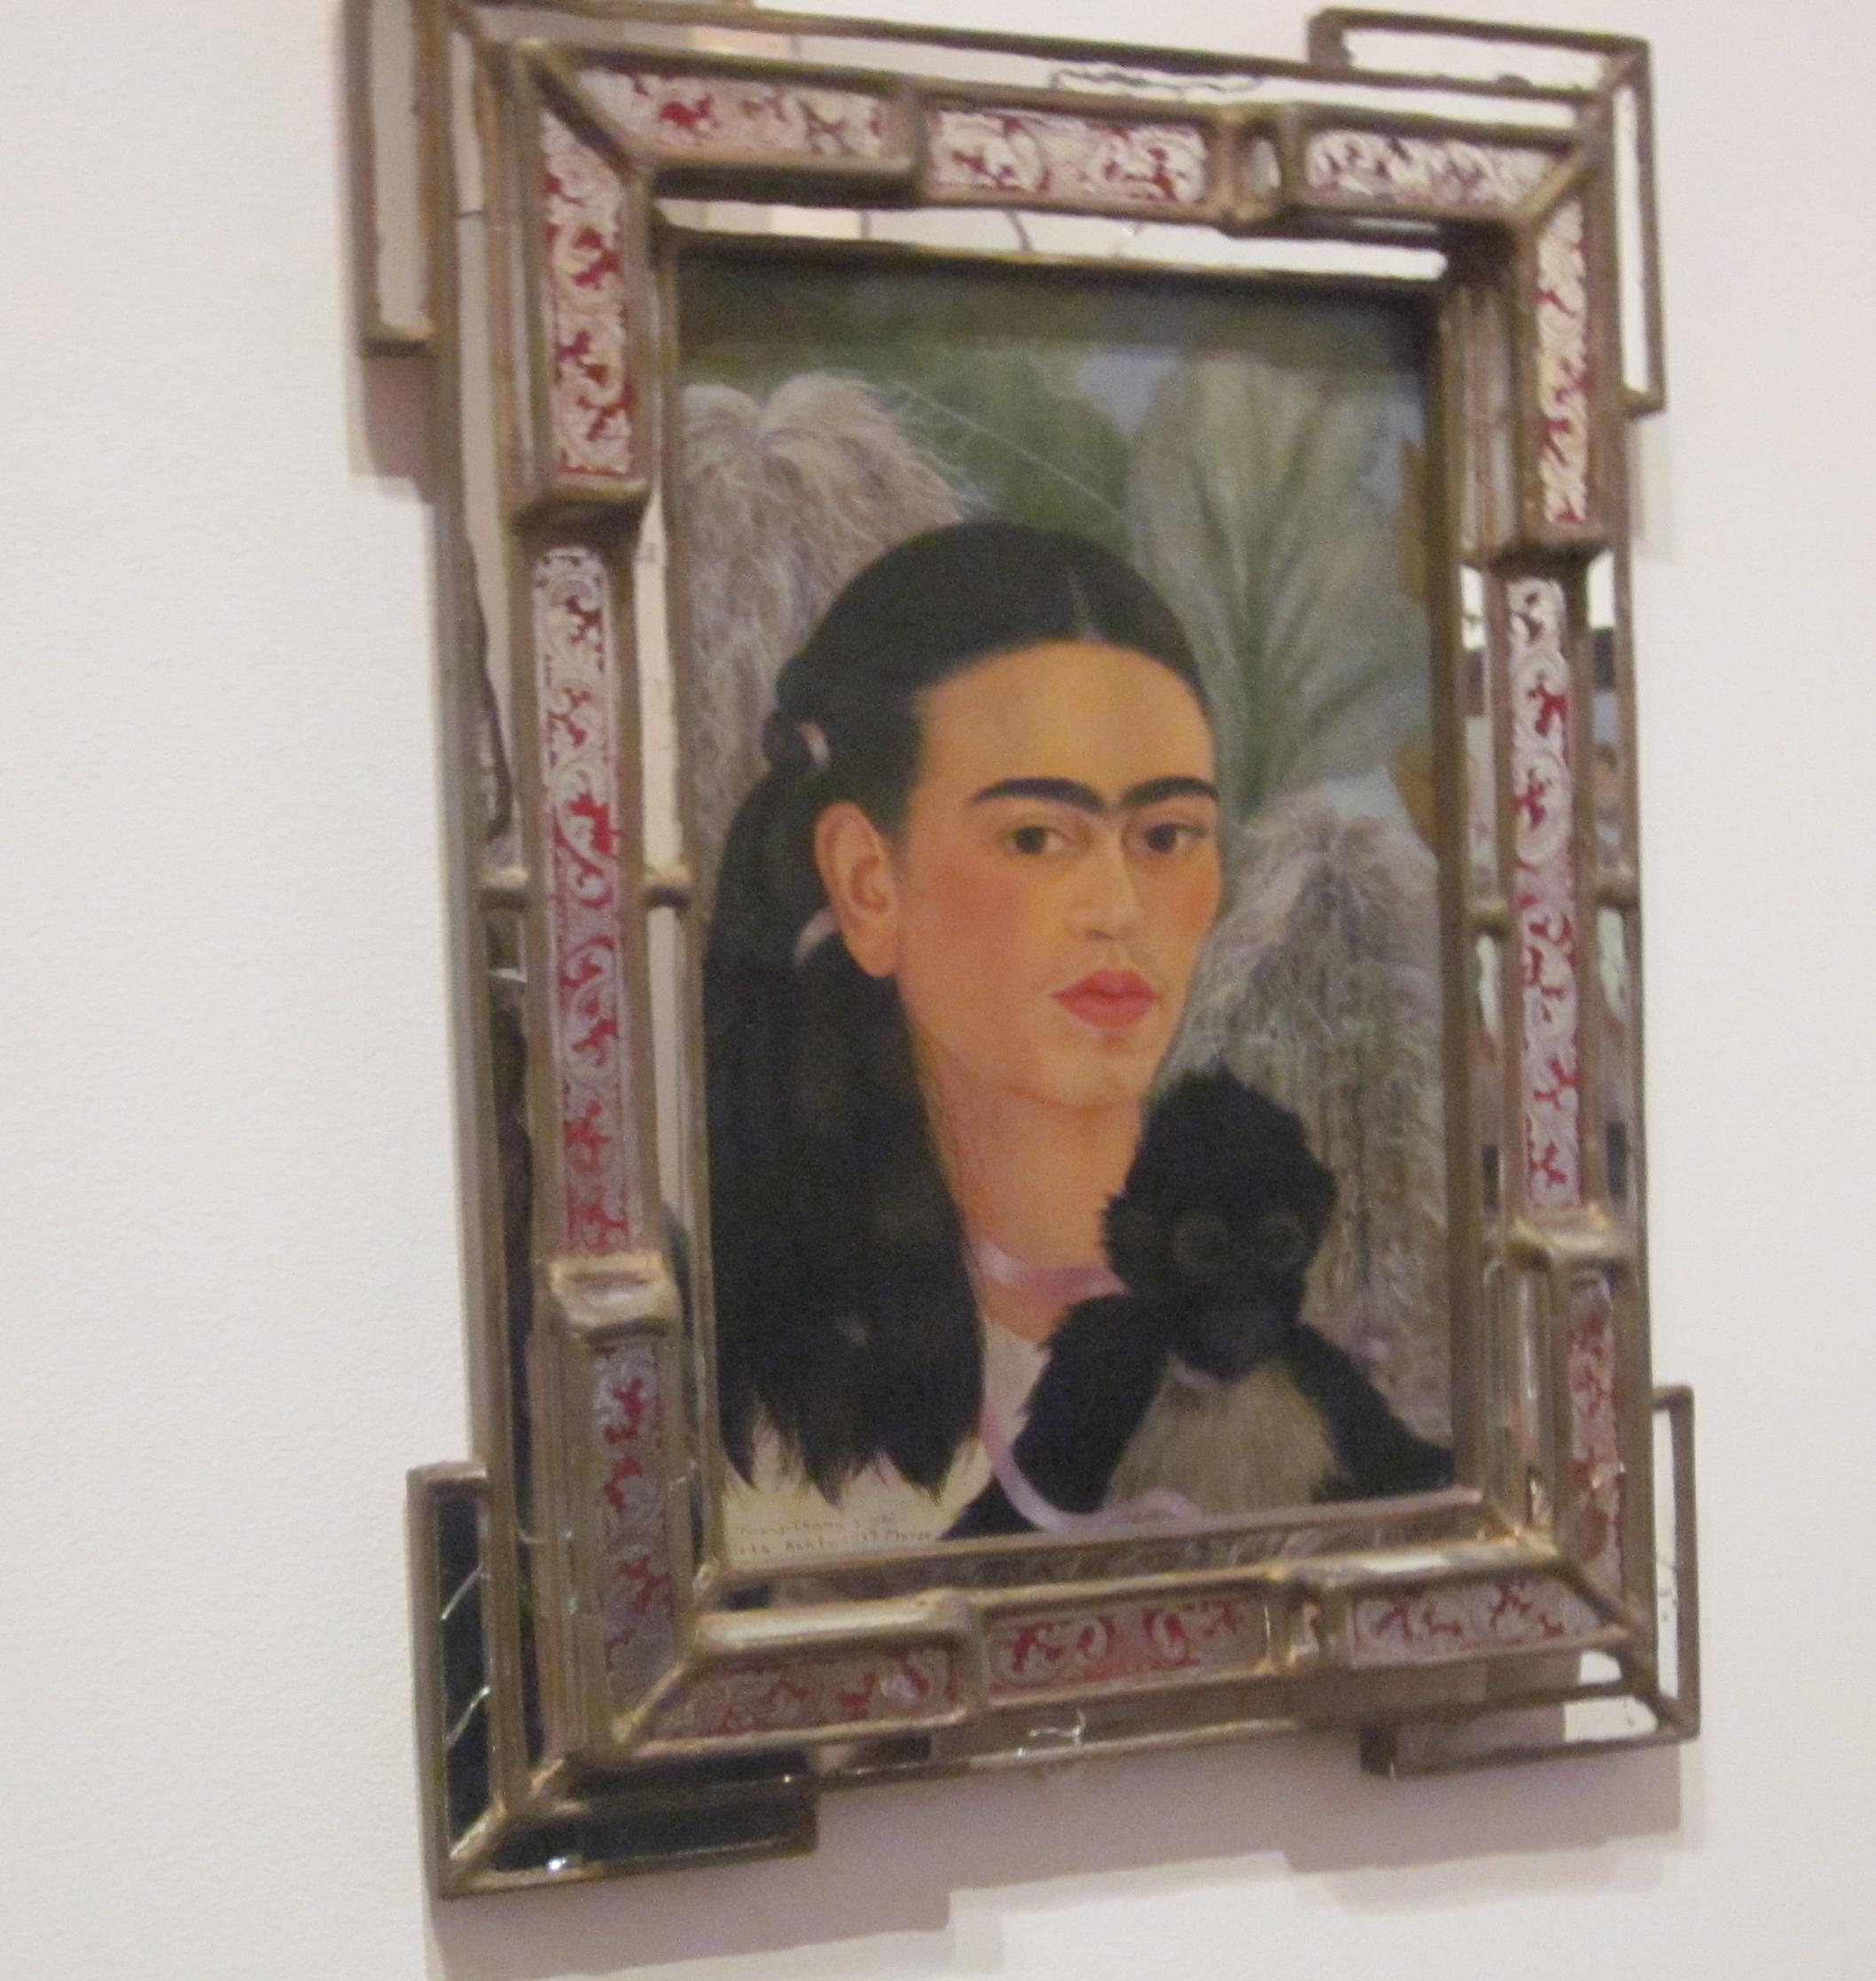 frida kahlo self portrait museum of modern art new york